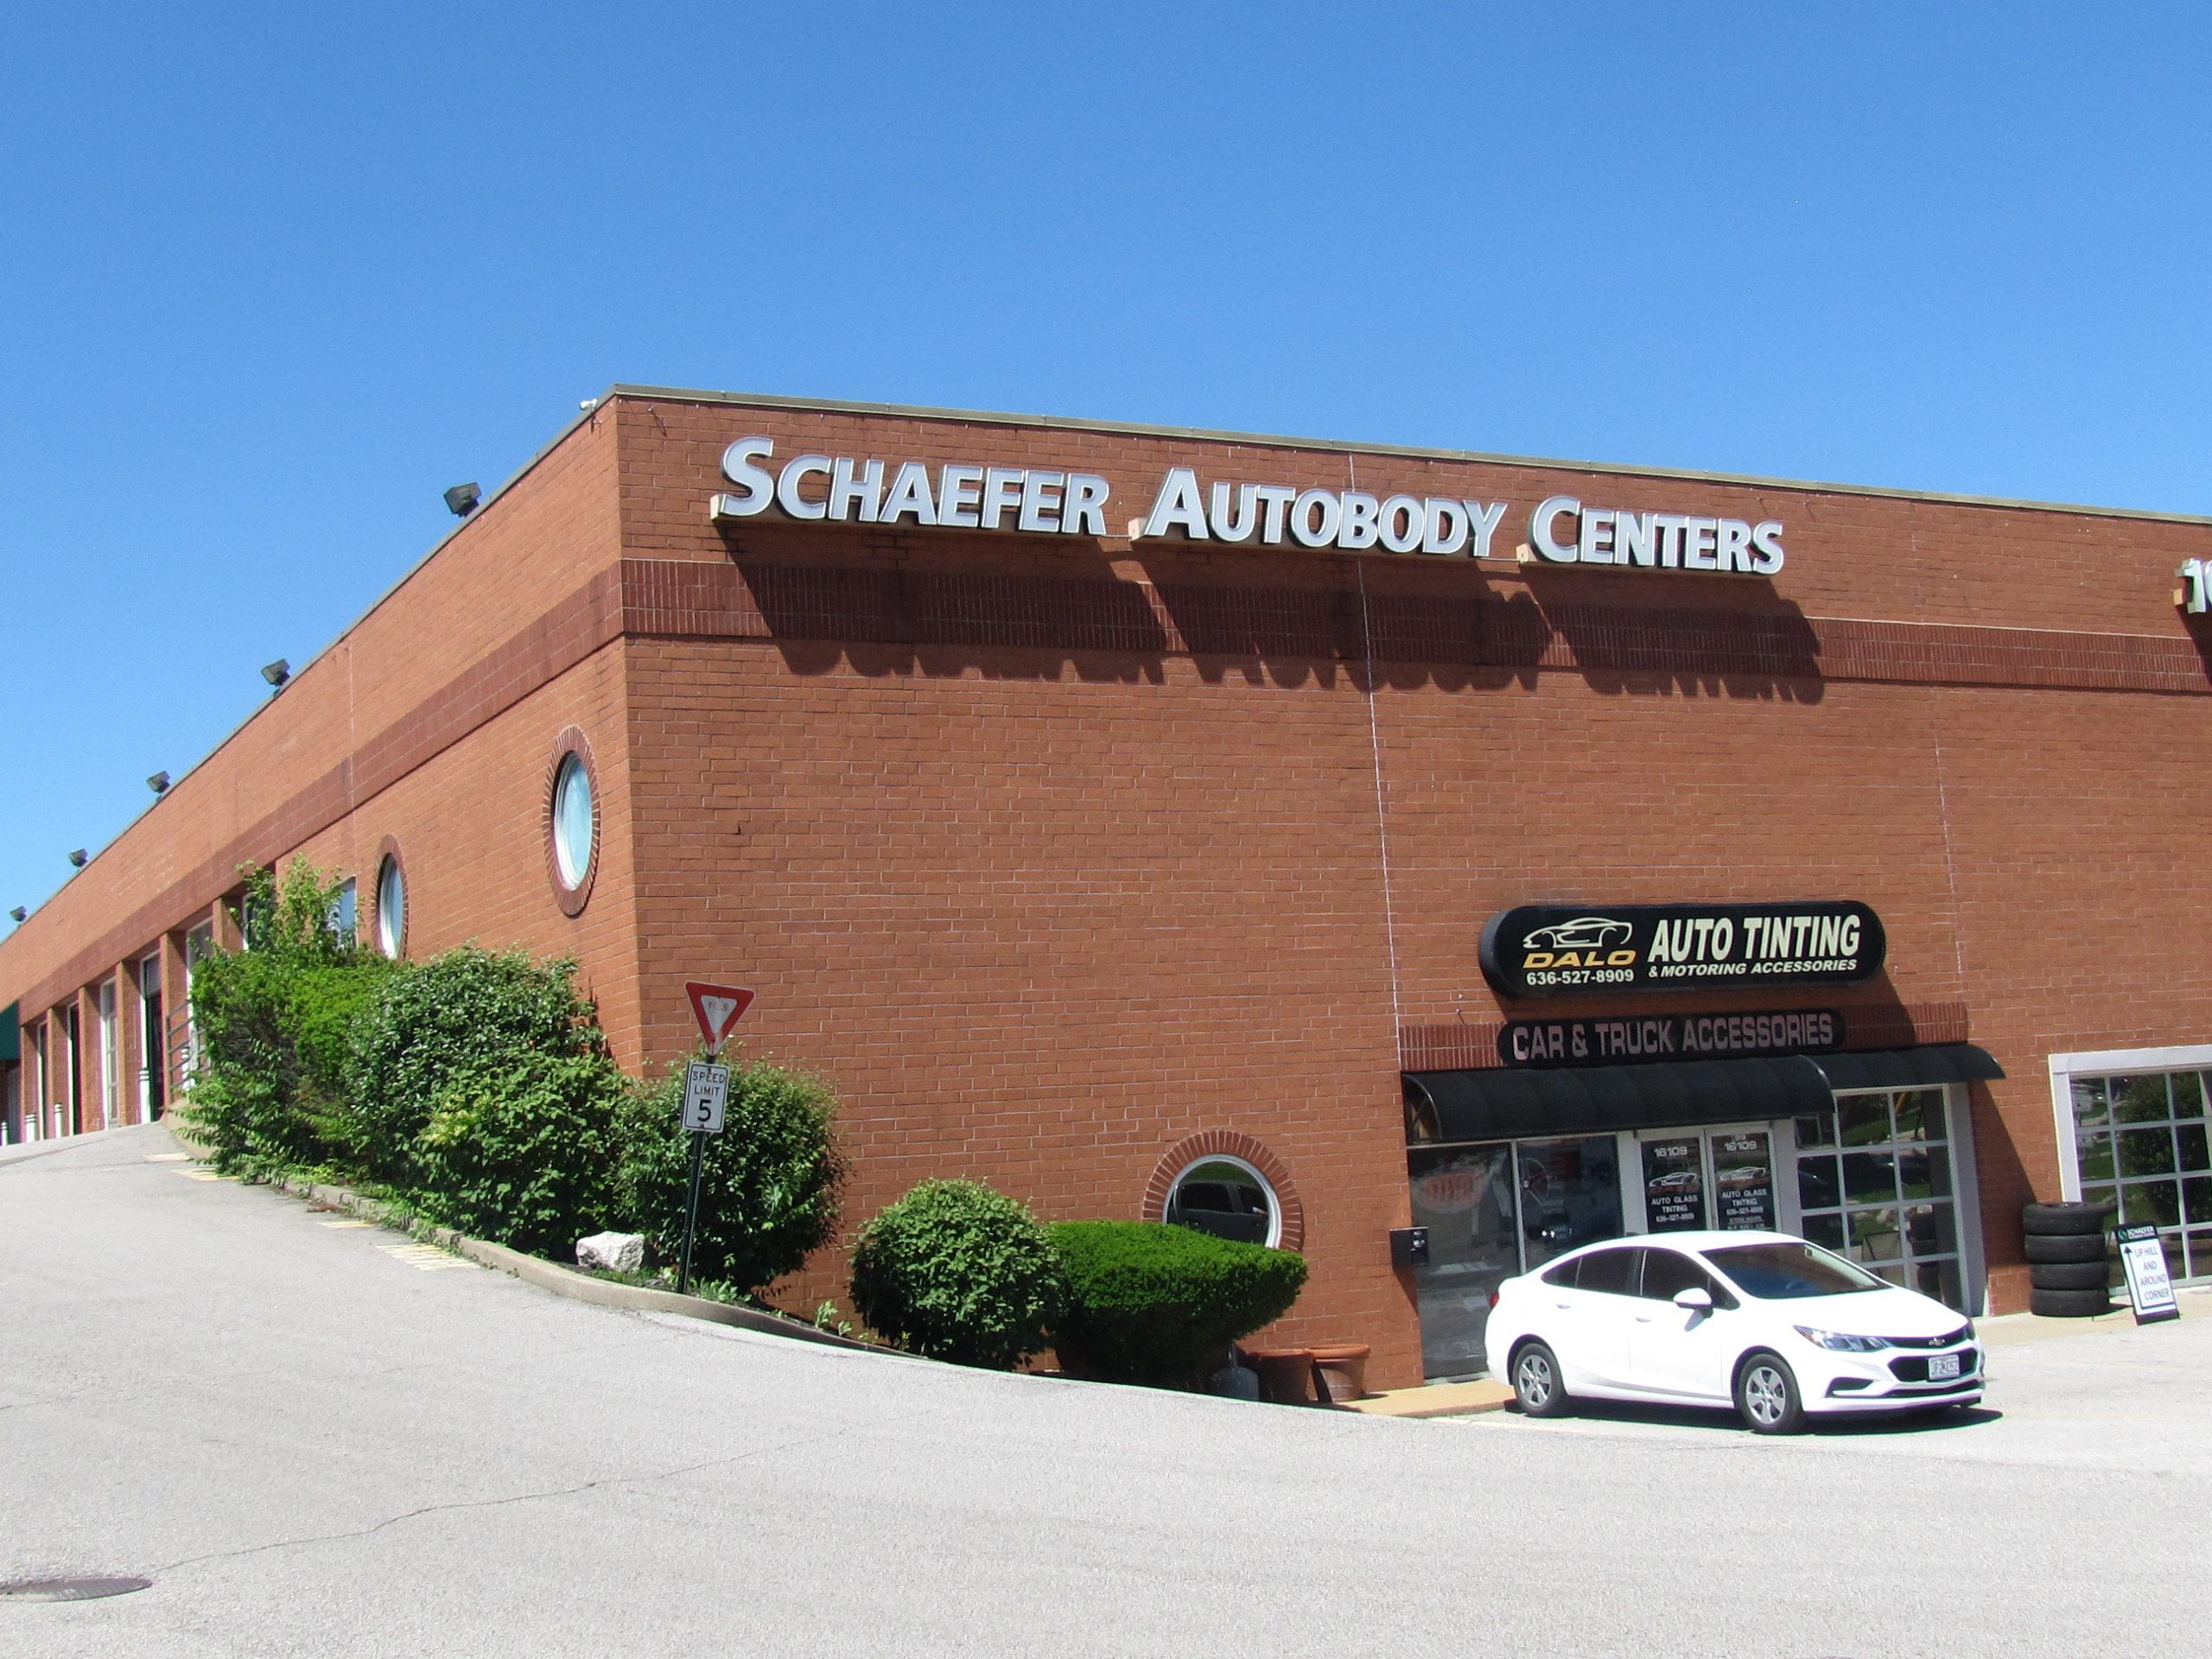 Exterior of Schaefer Autobody Center Ellisville MO